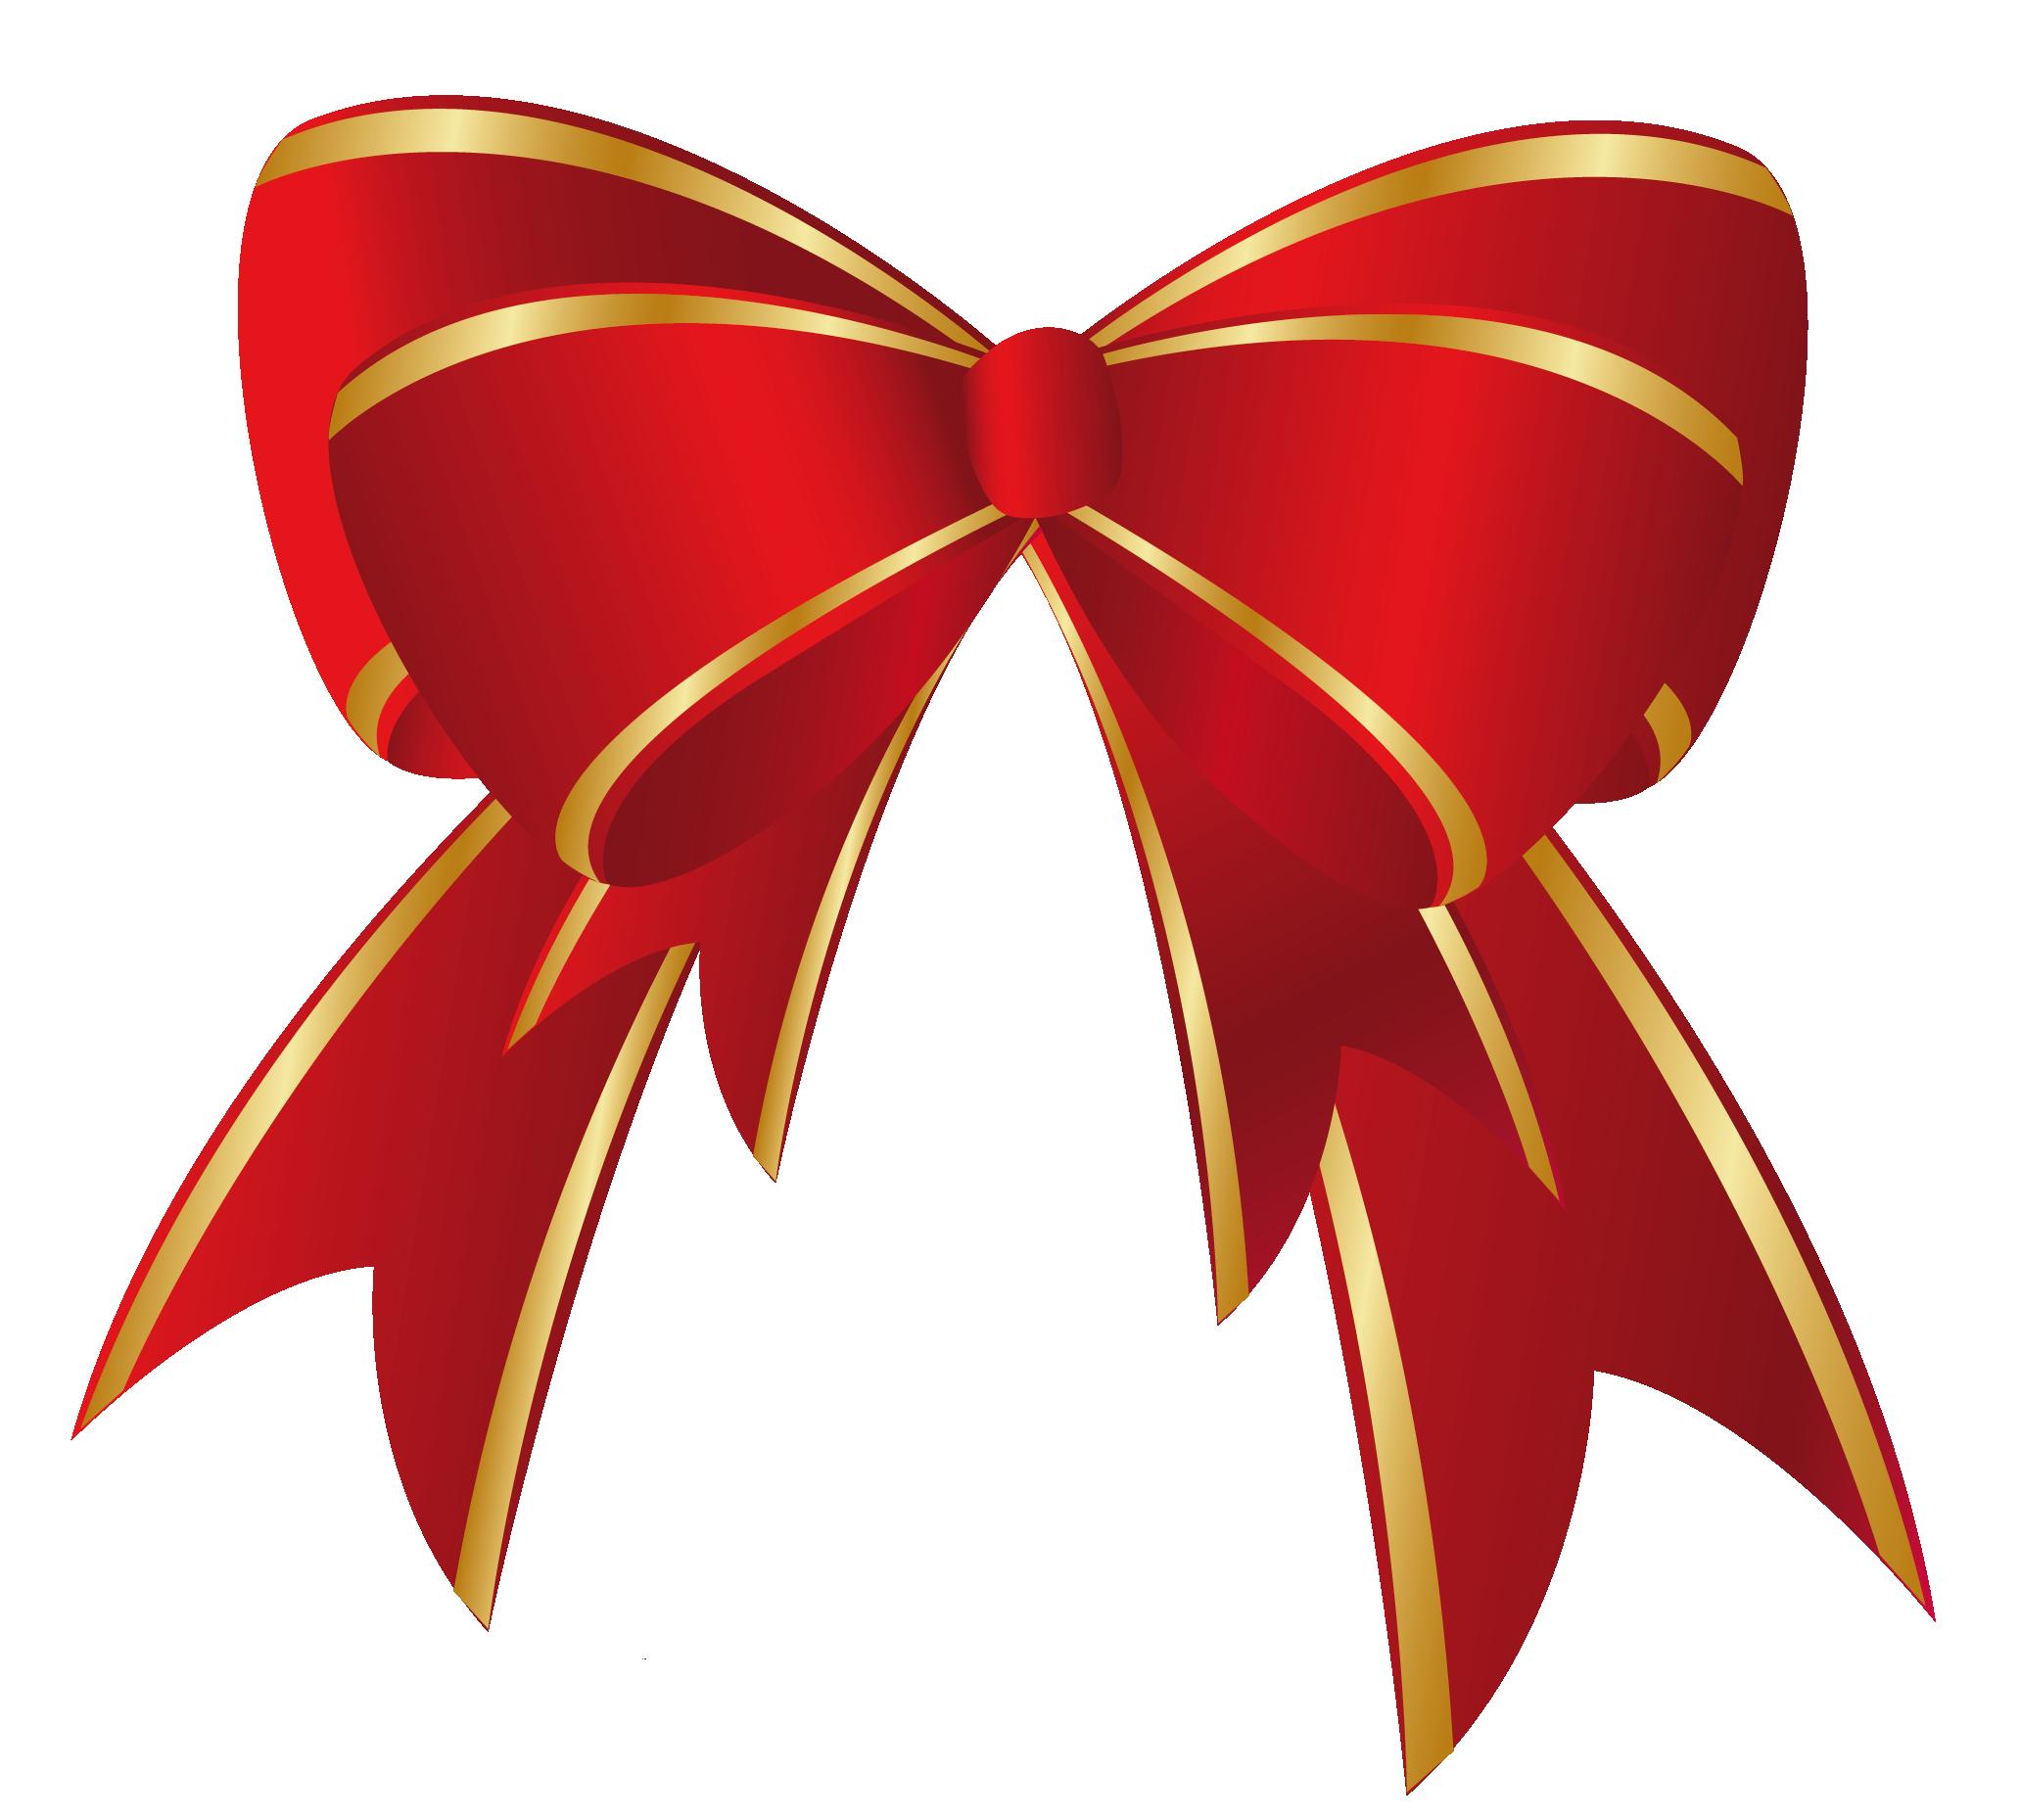 Red Bow Tie Cartoon - ClipArt Best